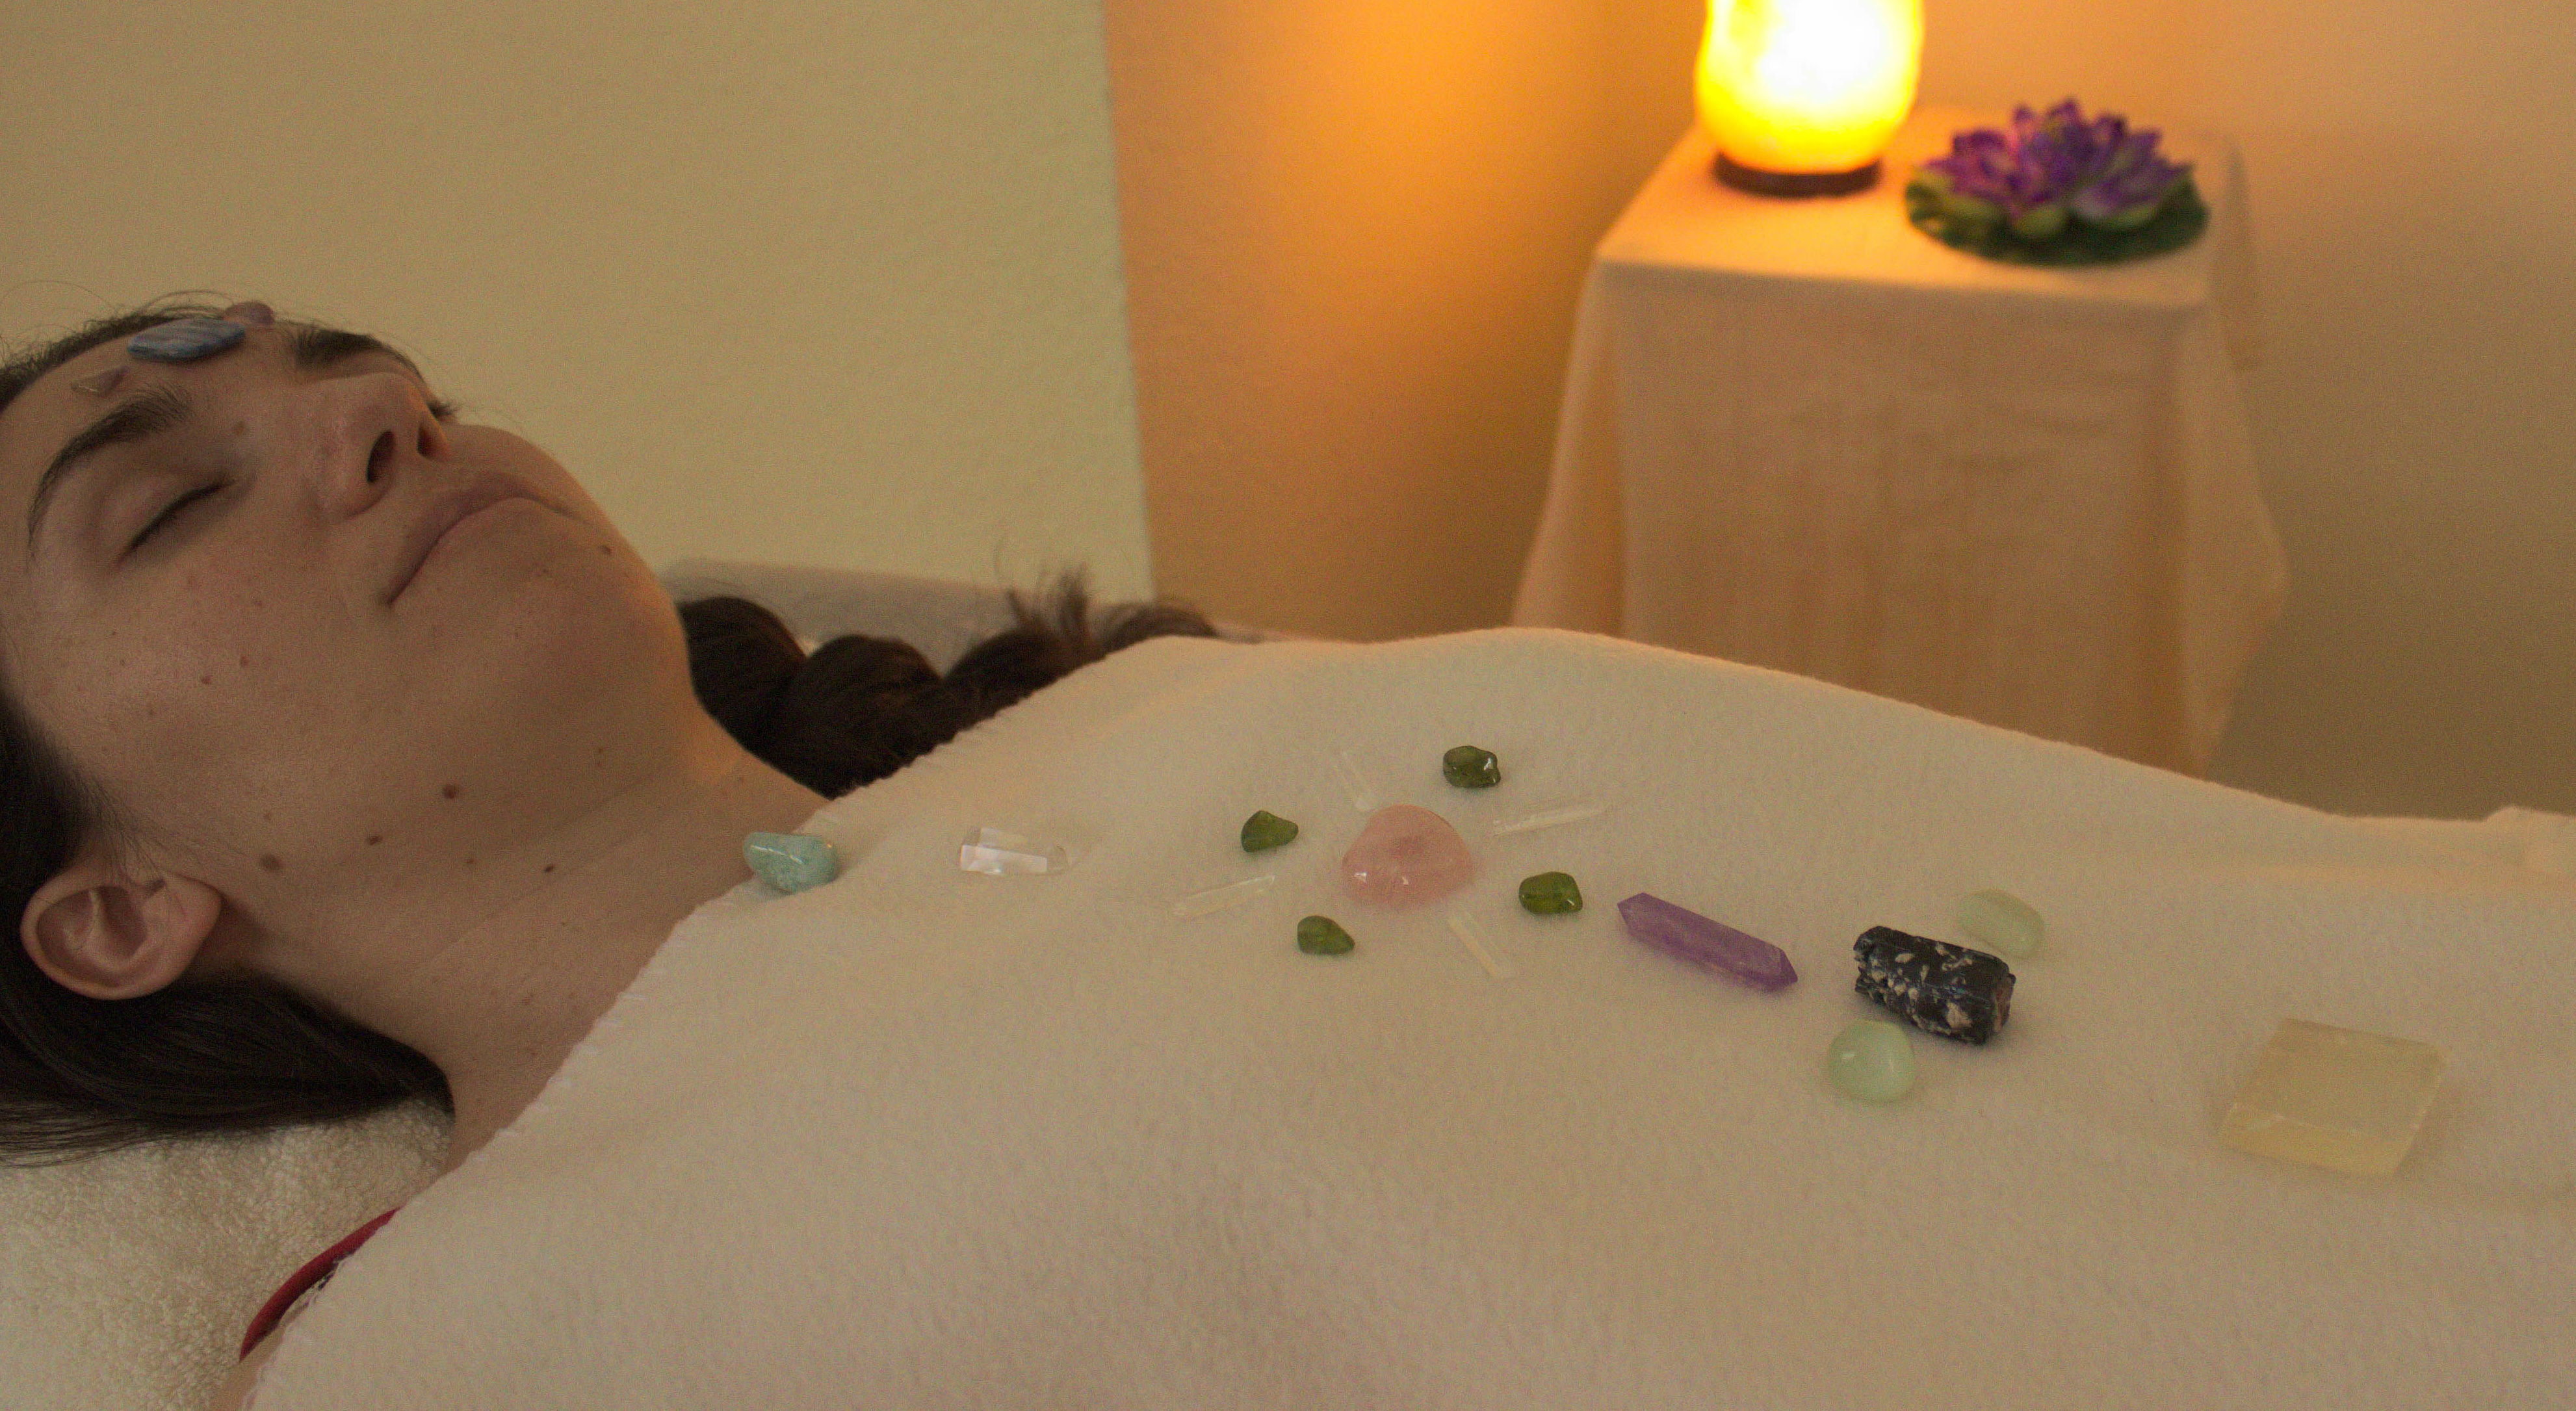 Terapia psico energética con cristales